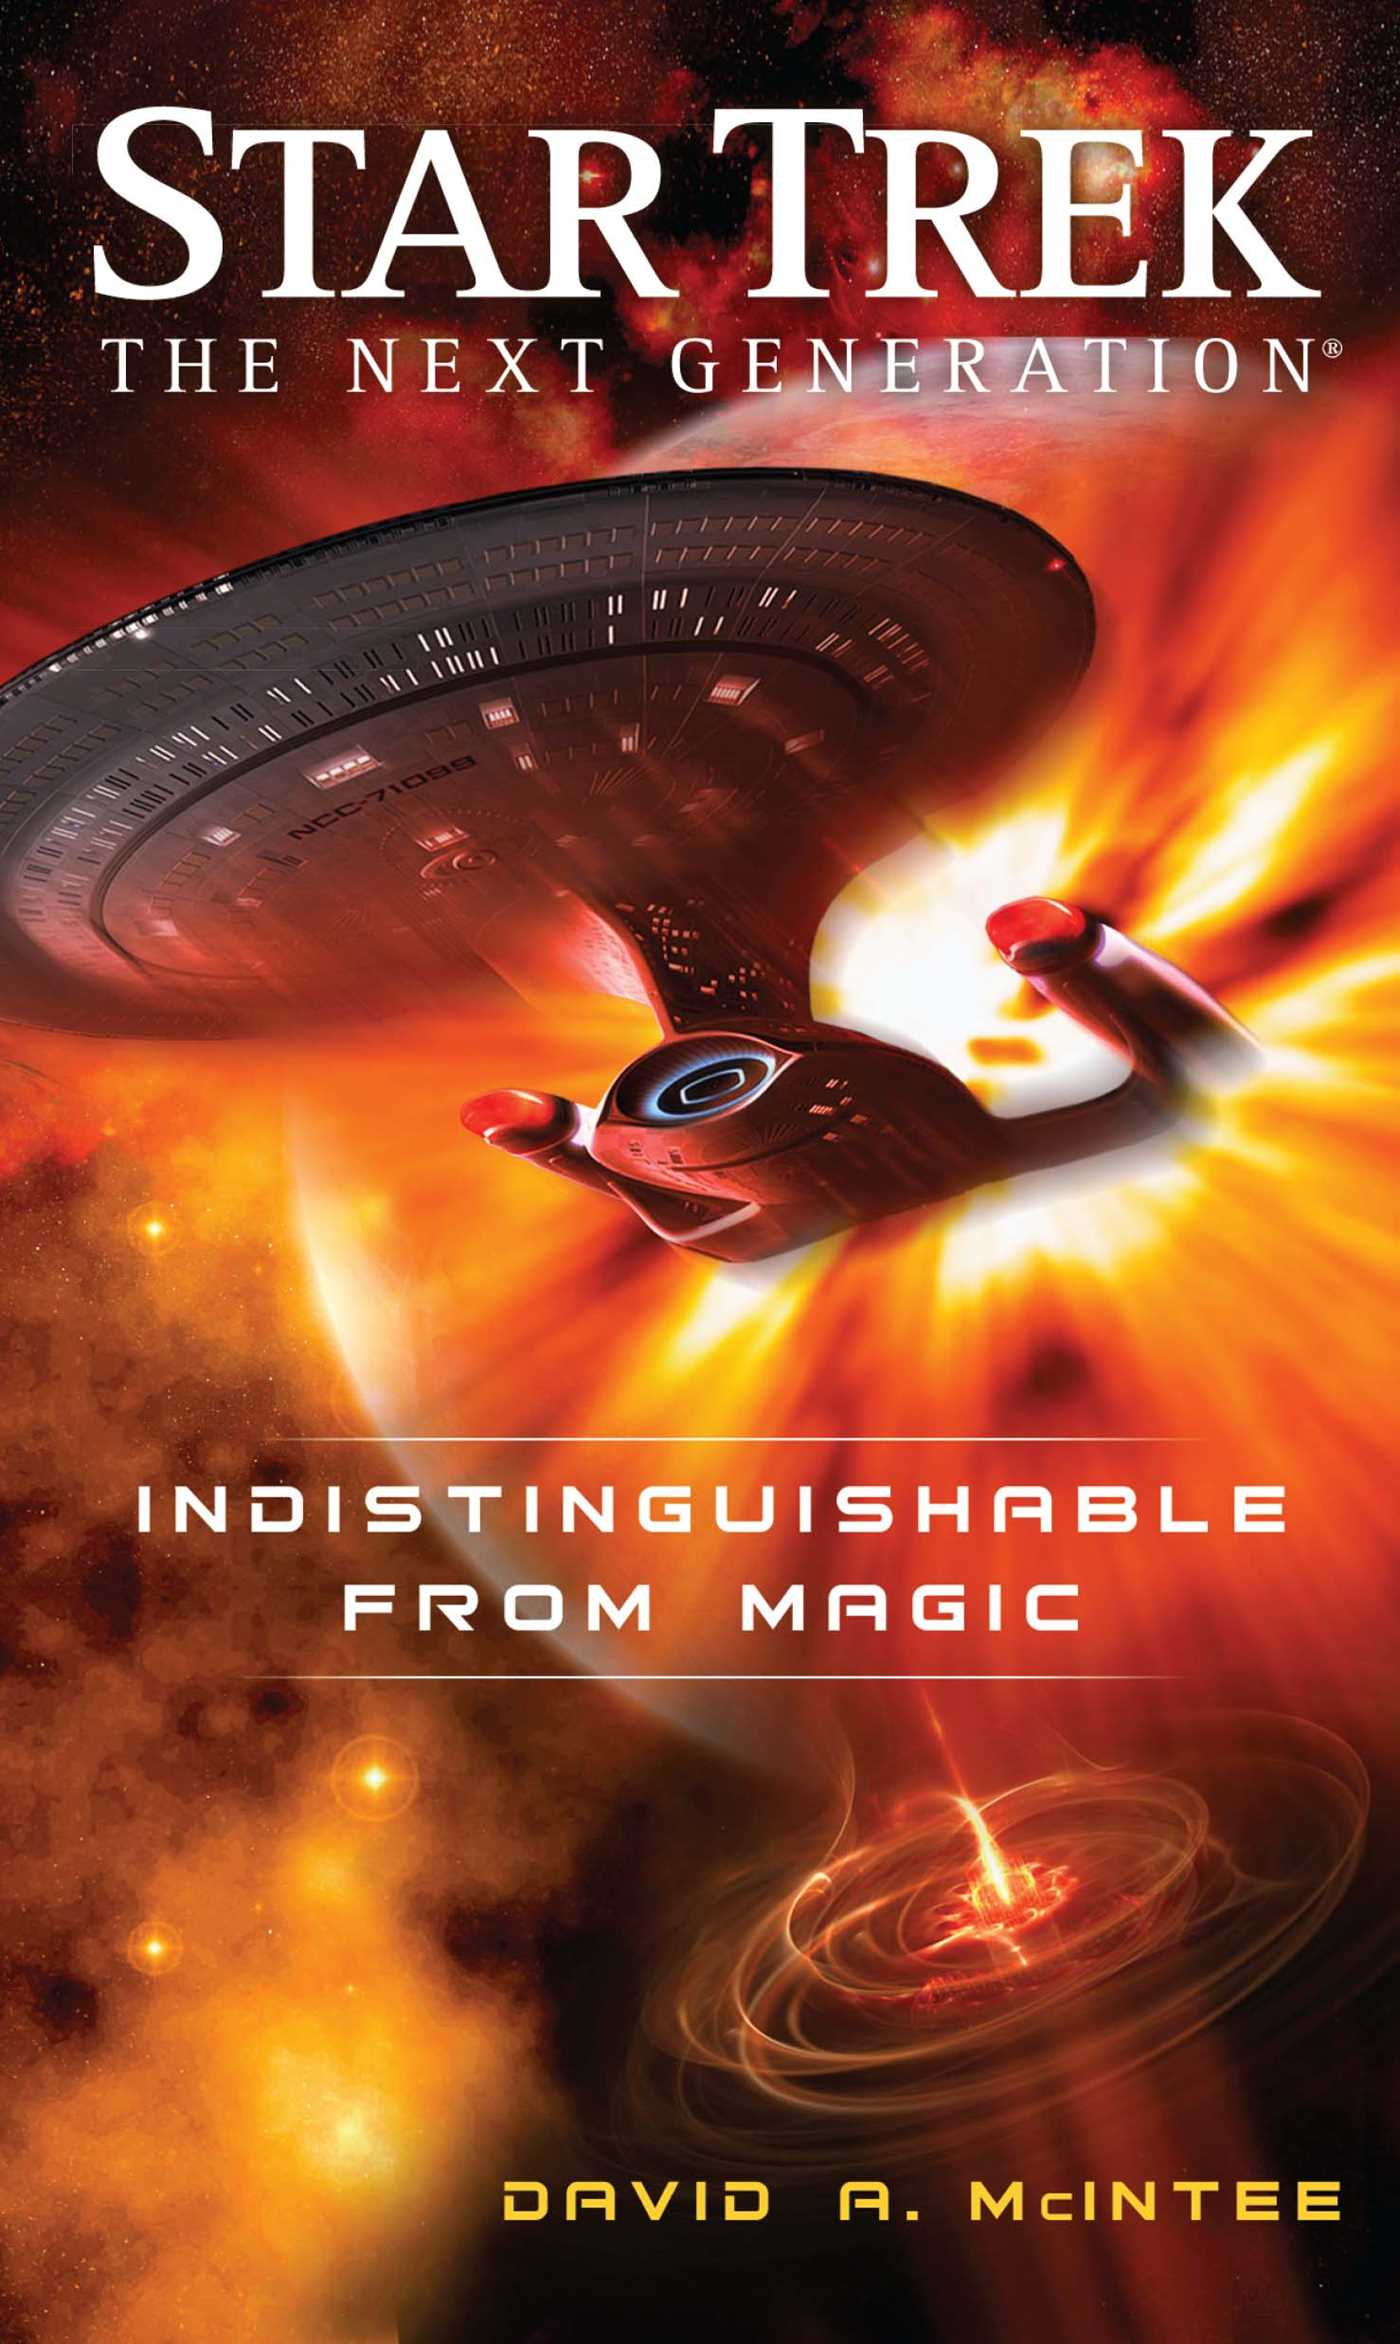 Star trek the next generation indistinguishable 9781501130182 hr